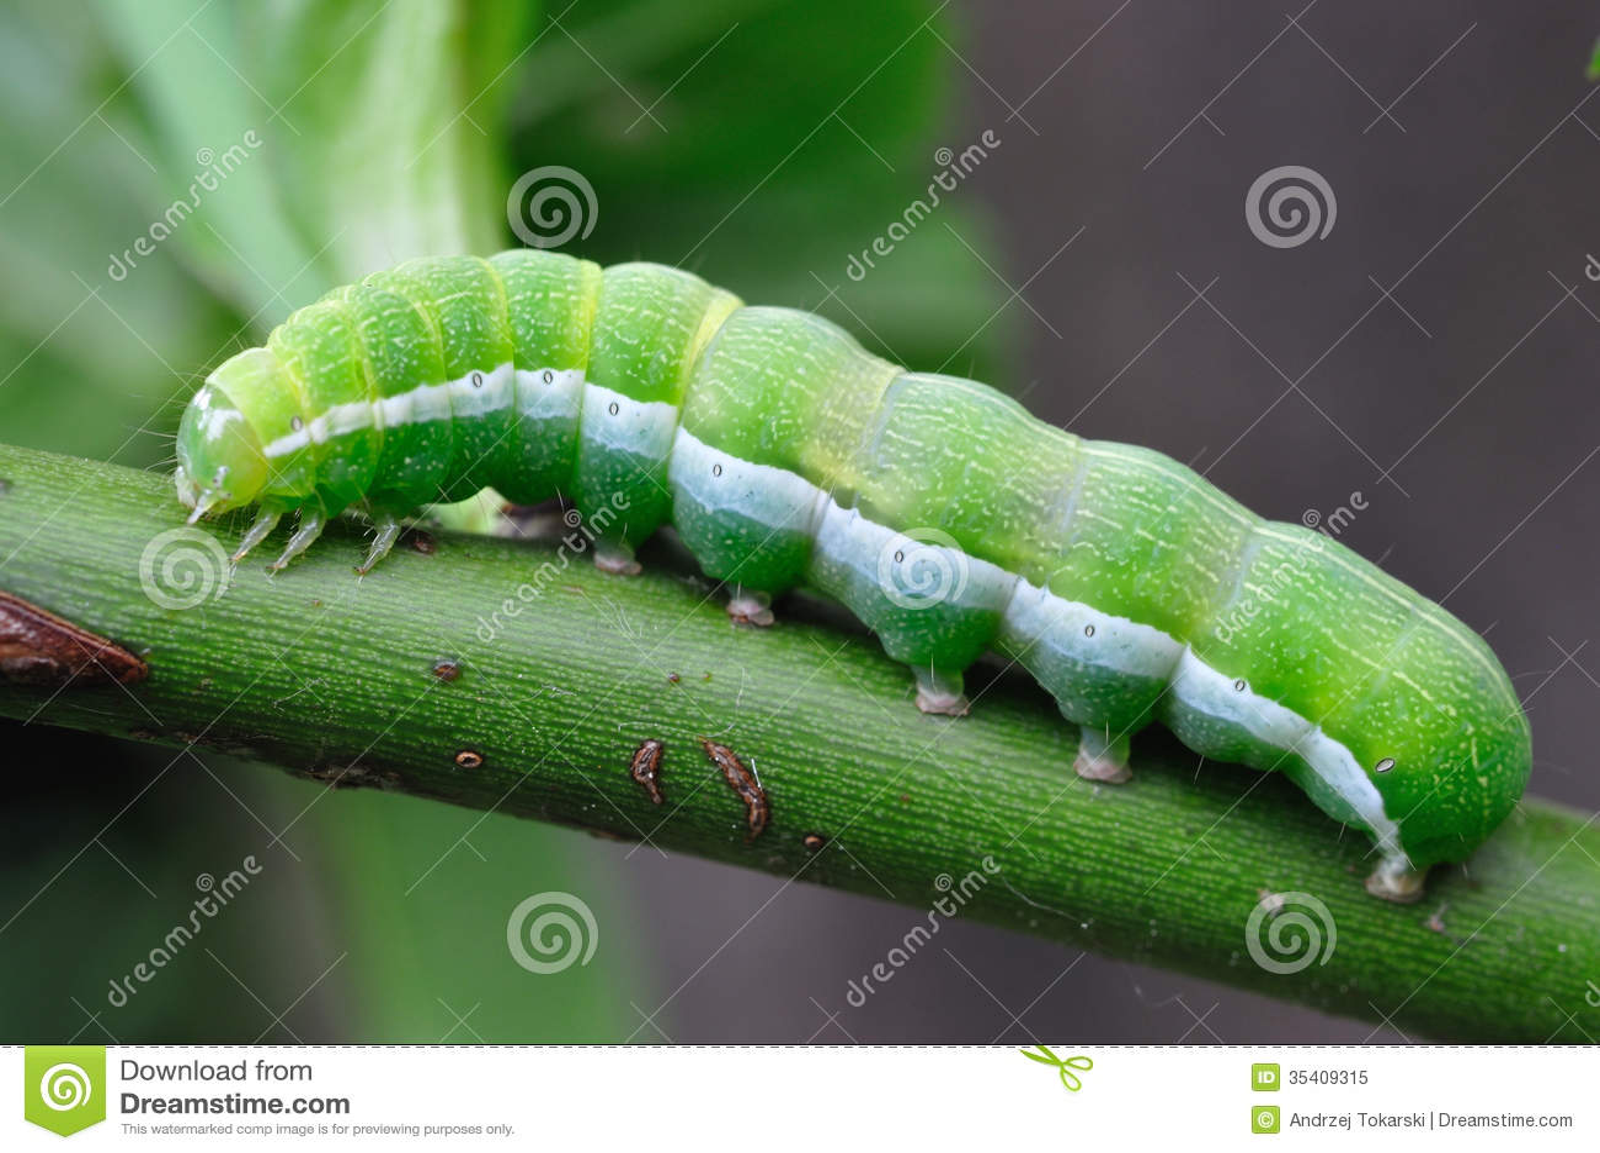 green caterpillar royalty free stock photo image 35409315 Cartoon Frog Animated Frog